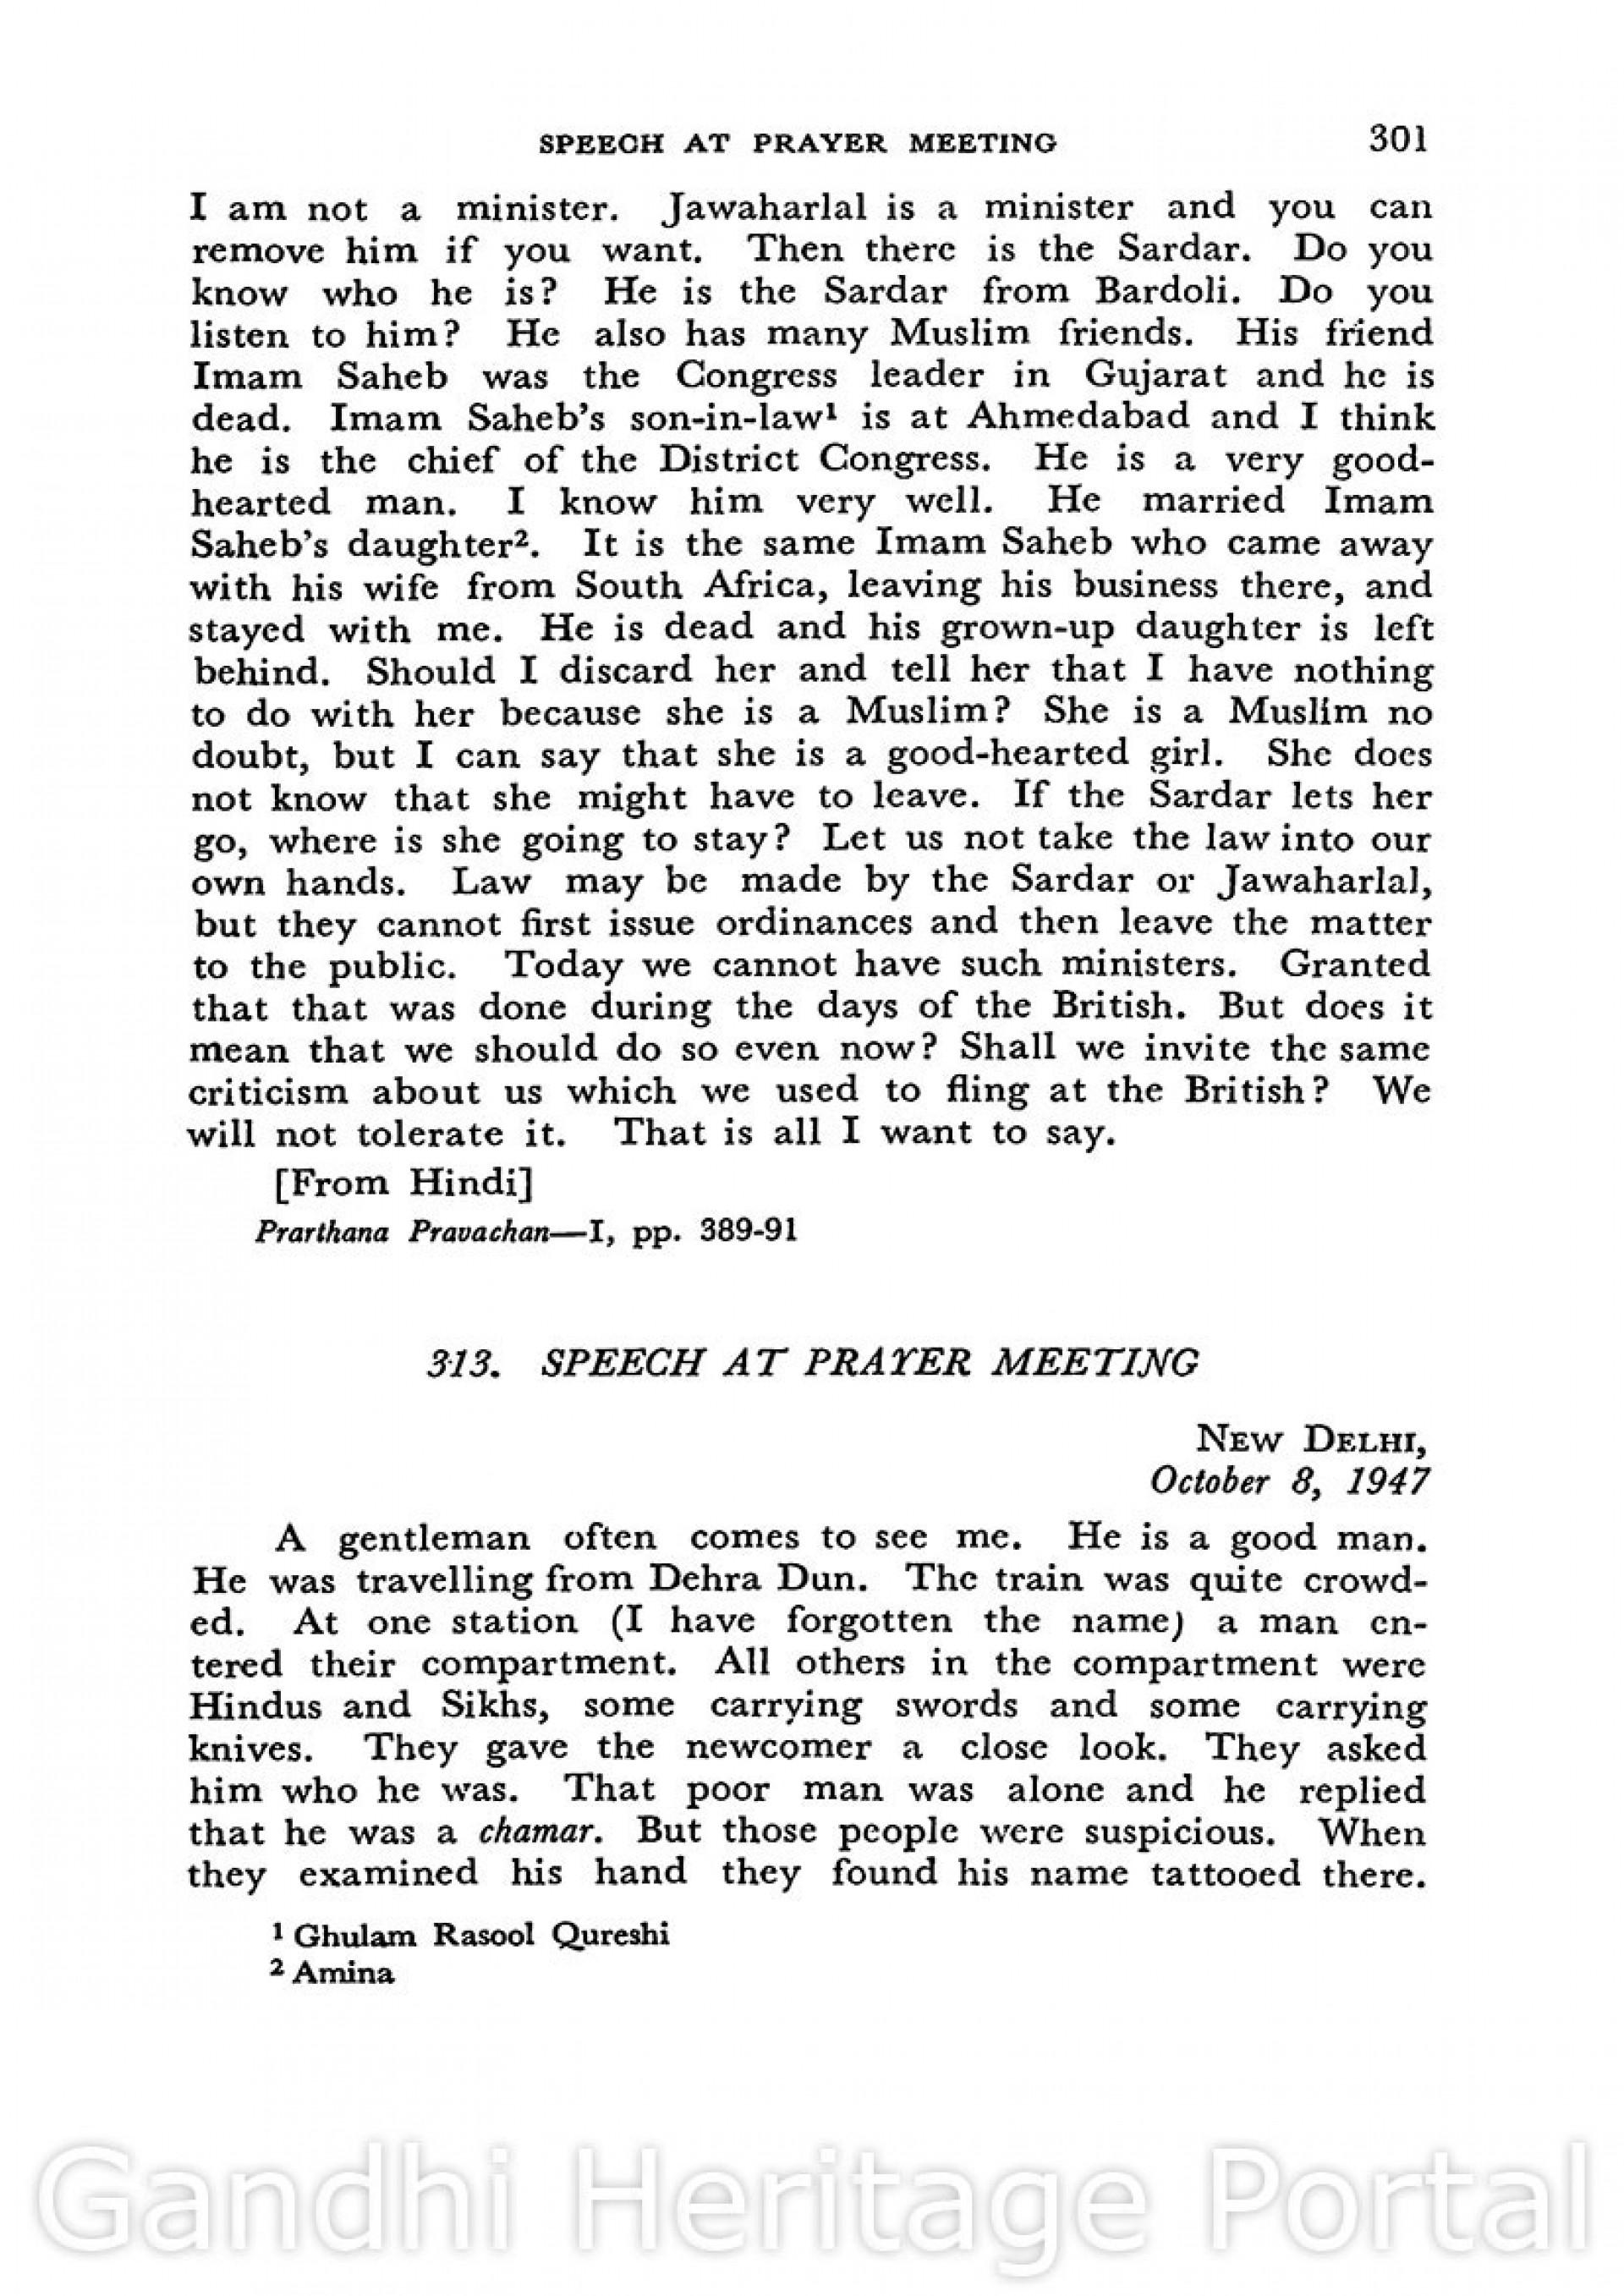 011 Mahatma Gandhi Essay In English Jayanti L Example Sensational Gandhiji Gujarati Pdf Free Download Hindi Language Ma Nibandh 1920